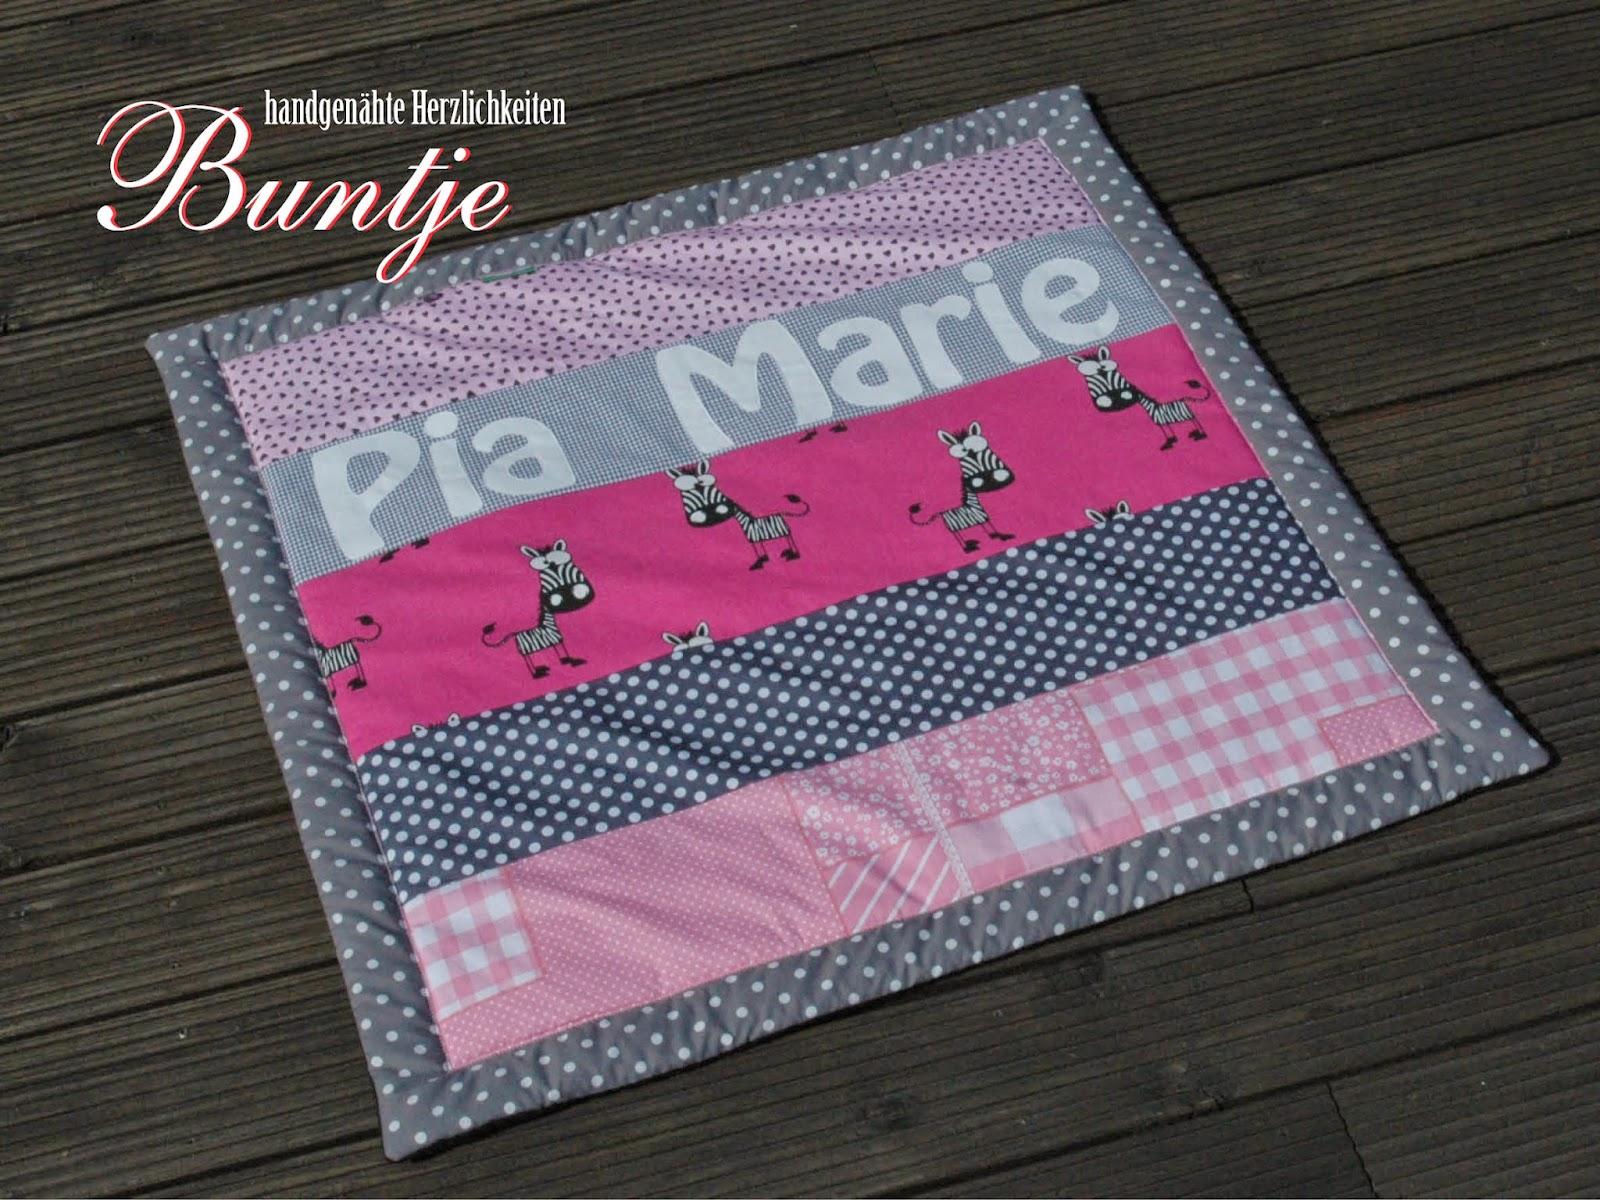 Kuscheldecke Krabbeldecke Decke Baby Name Mädchen punk rosa grau Zebra Dschungel Afrika Pia Marie Geschenk Geburt Taufe Baumwolle Fleece kuschelig nähen Buntje